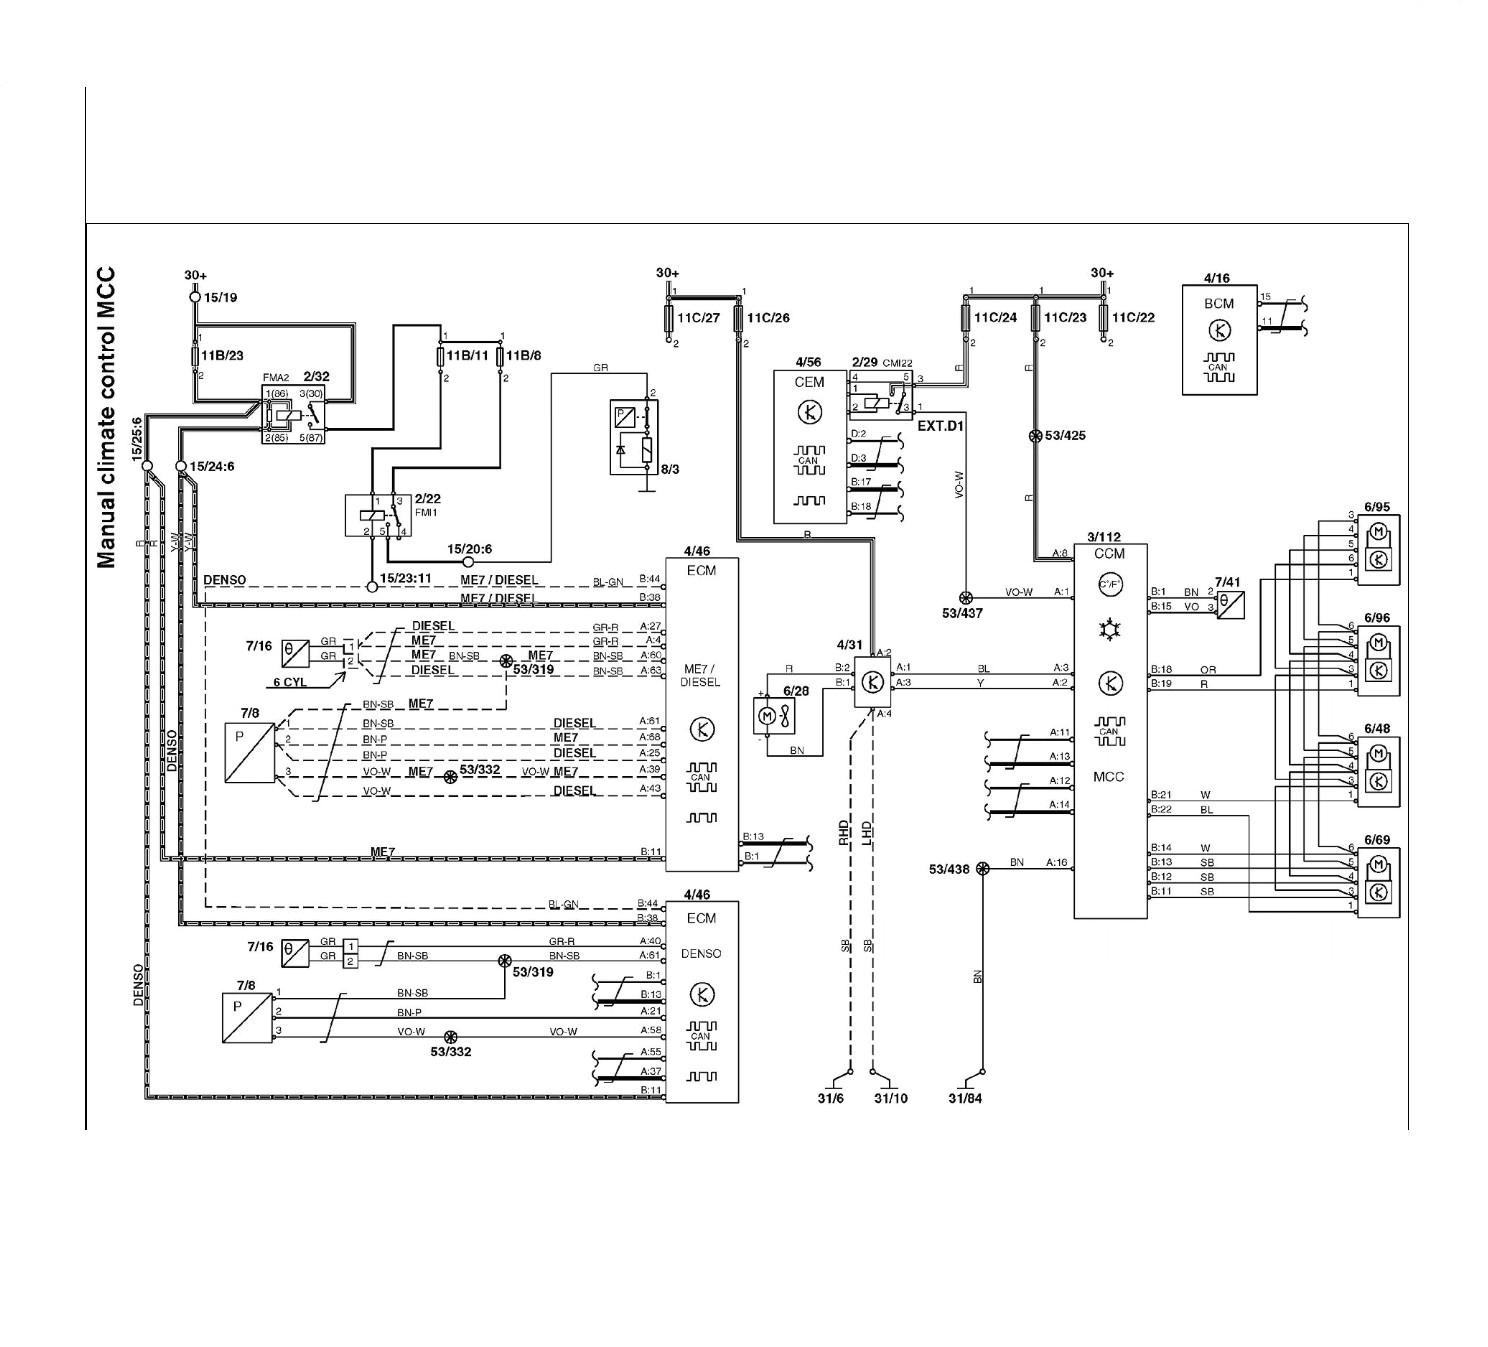 volvo s60 wiring diagram inspirational volvo s60 wiring diagrams plete wiring diagrams